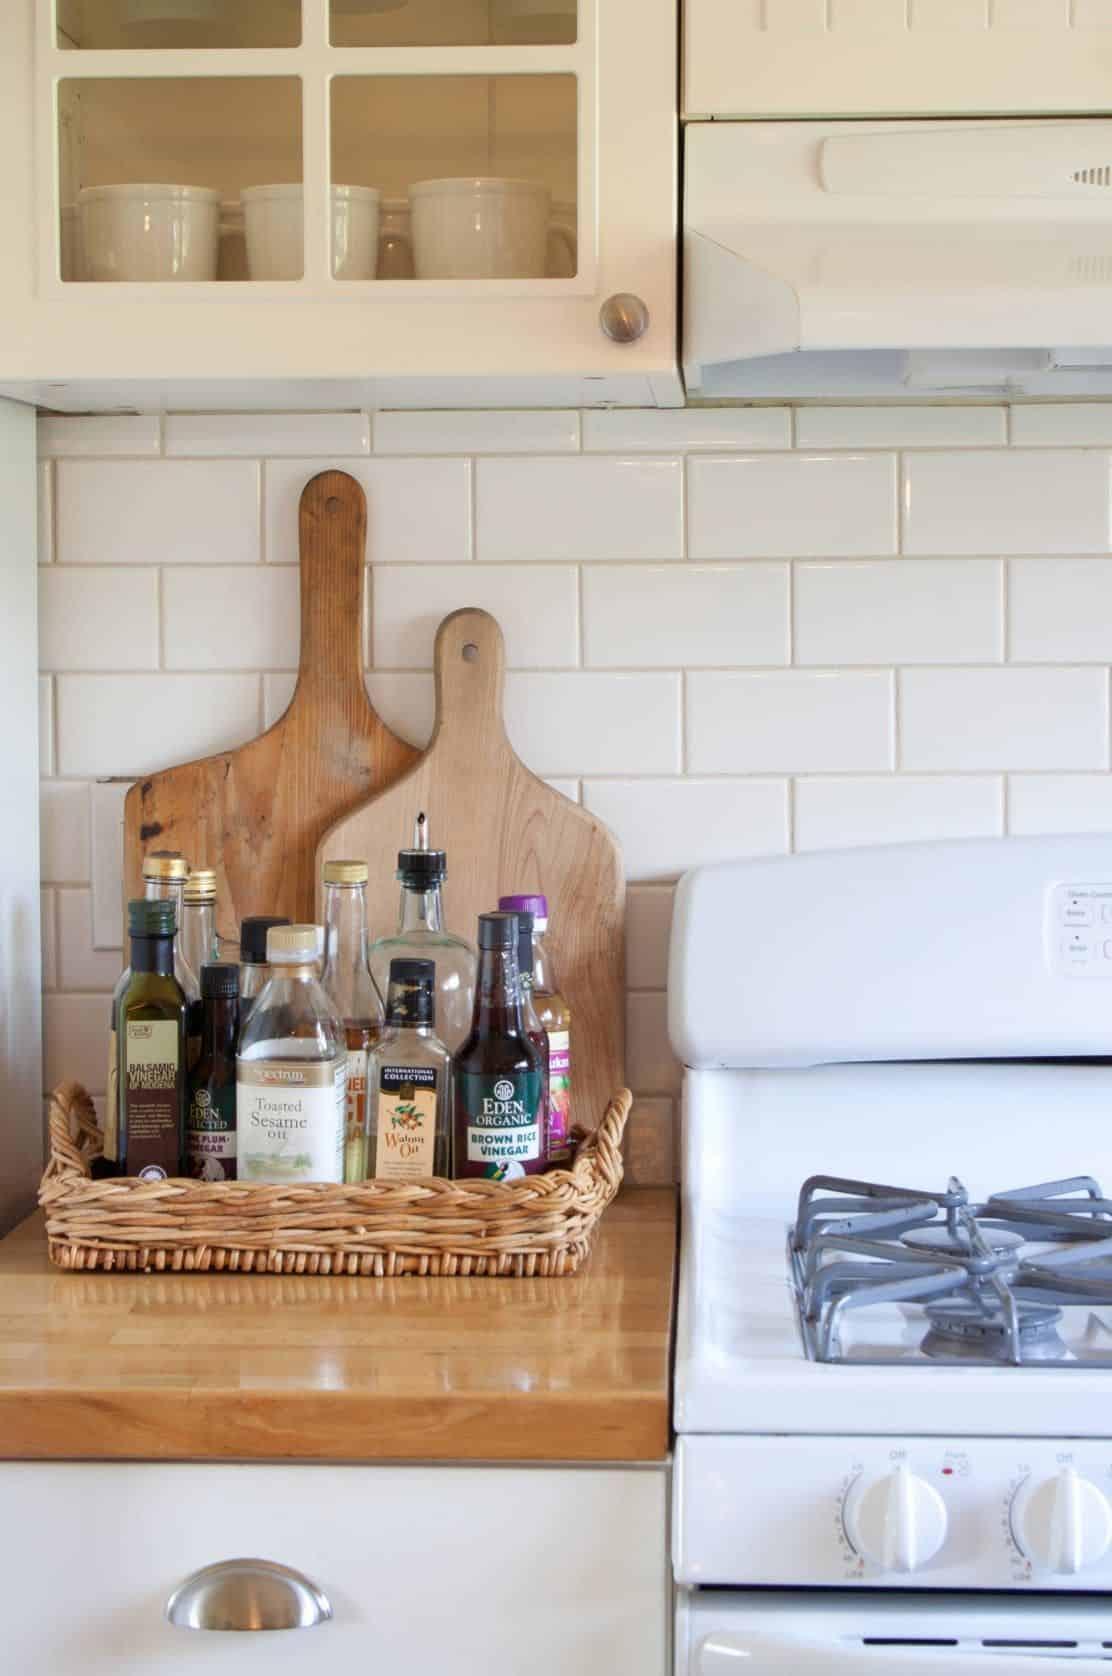 tray in kitchen